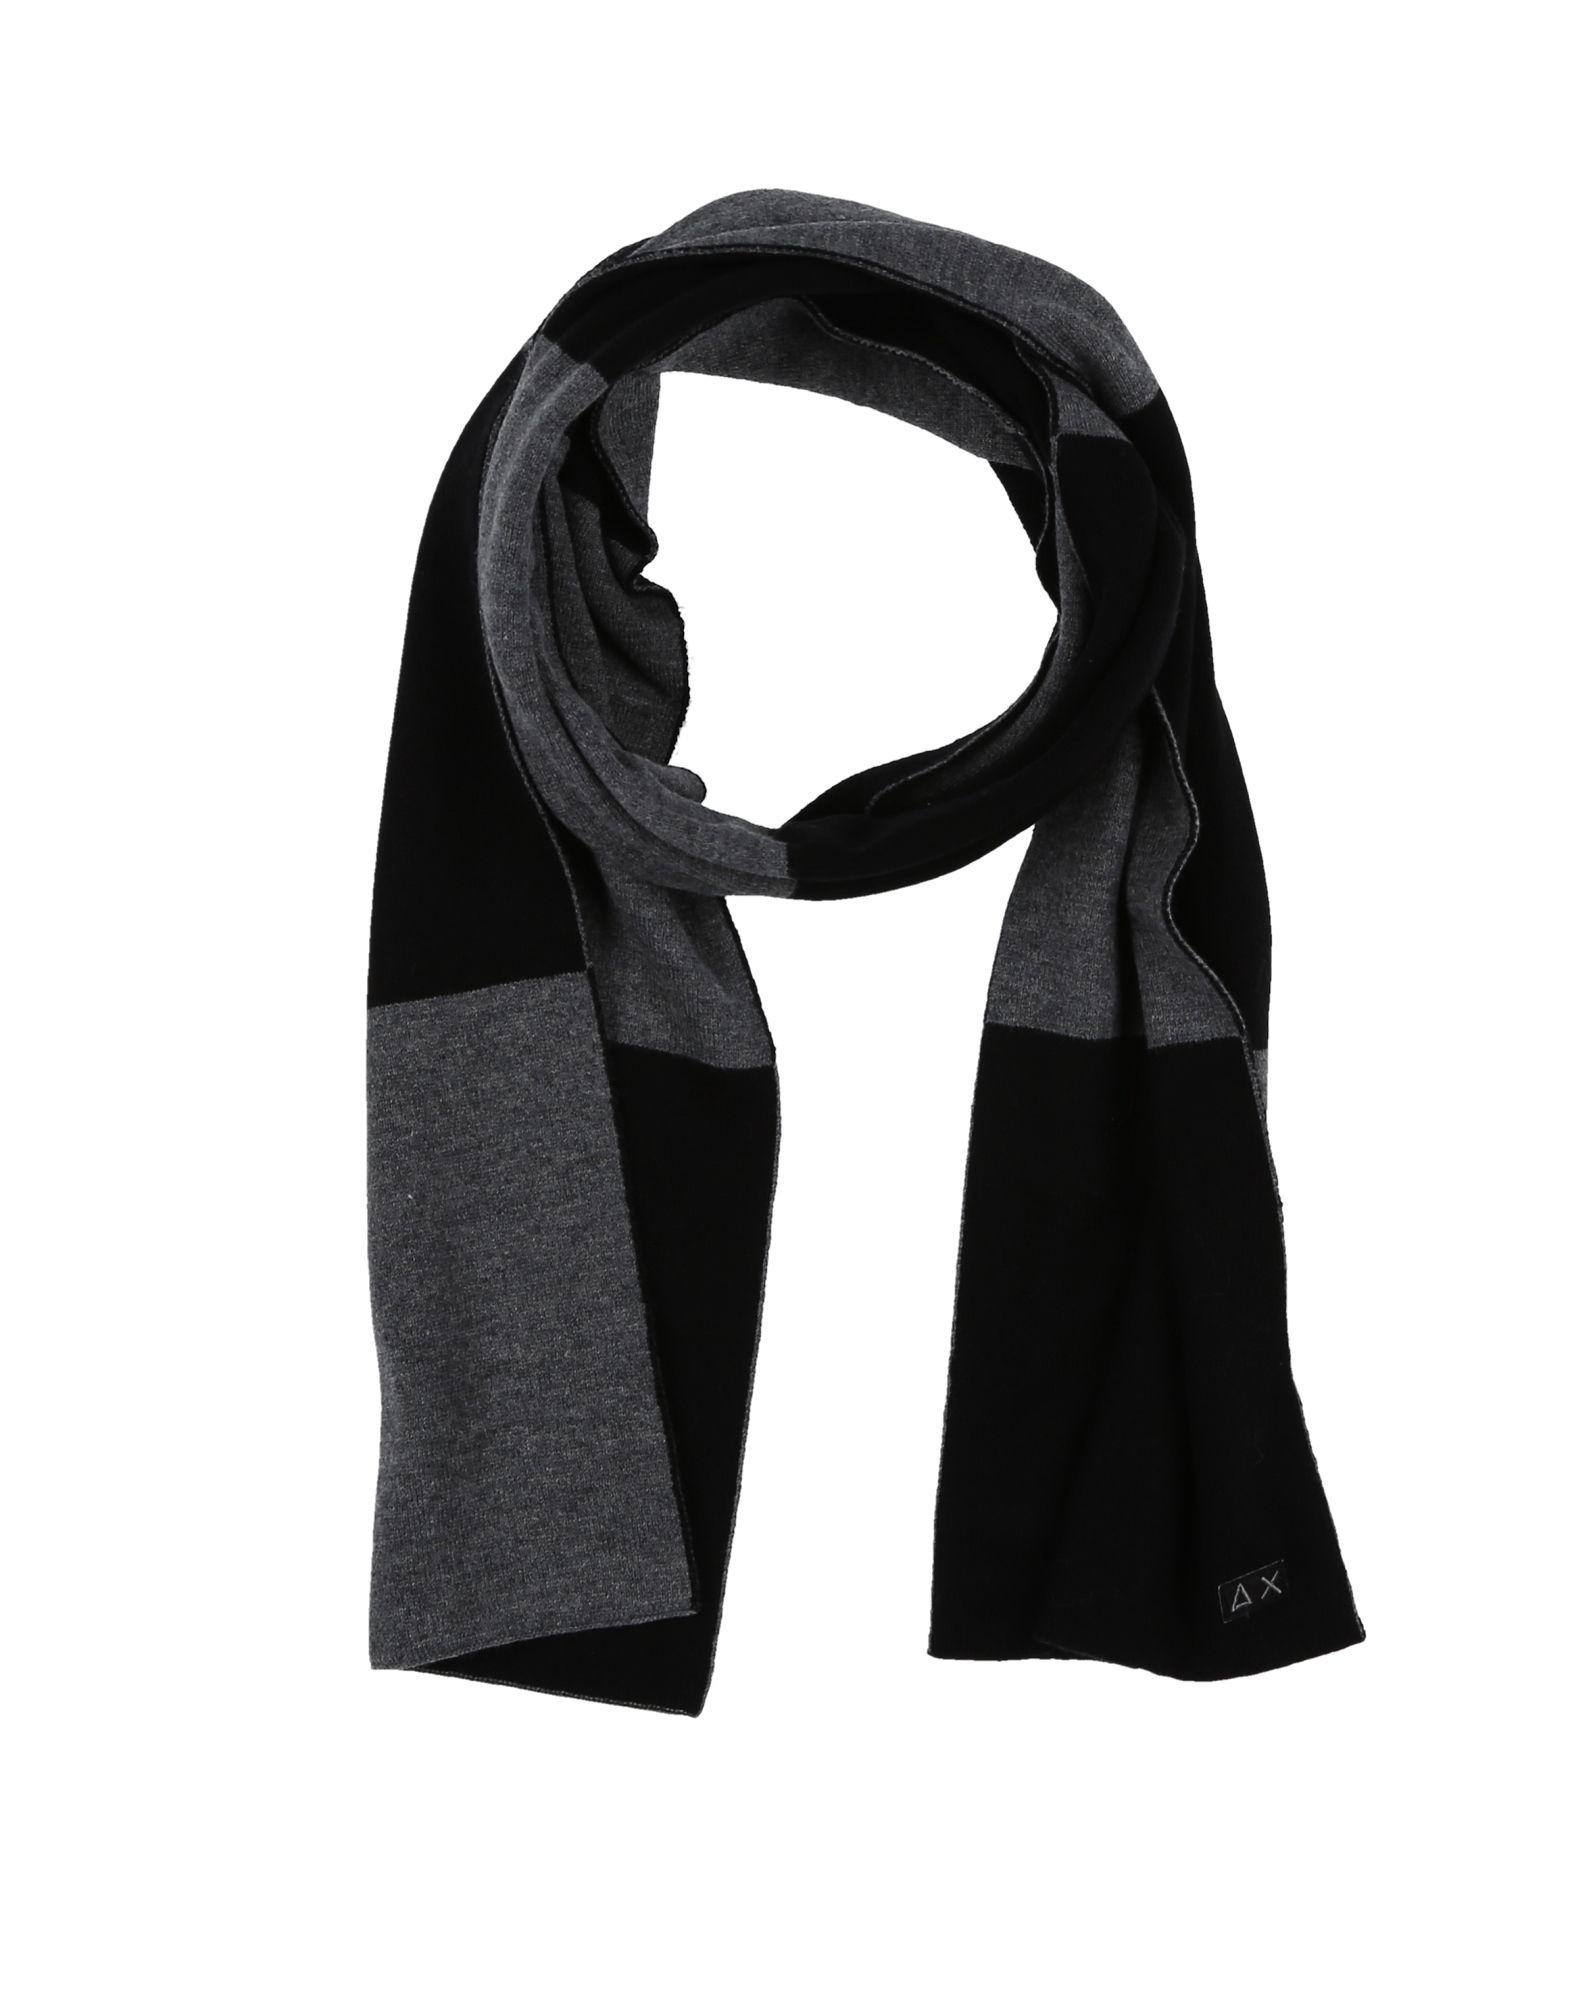 ACCESSORIES - Oblong scarves Sun 68 ZBCoDgdVj2